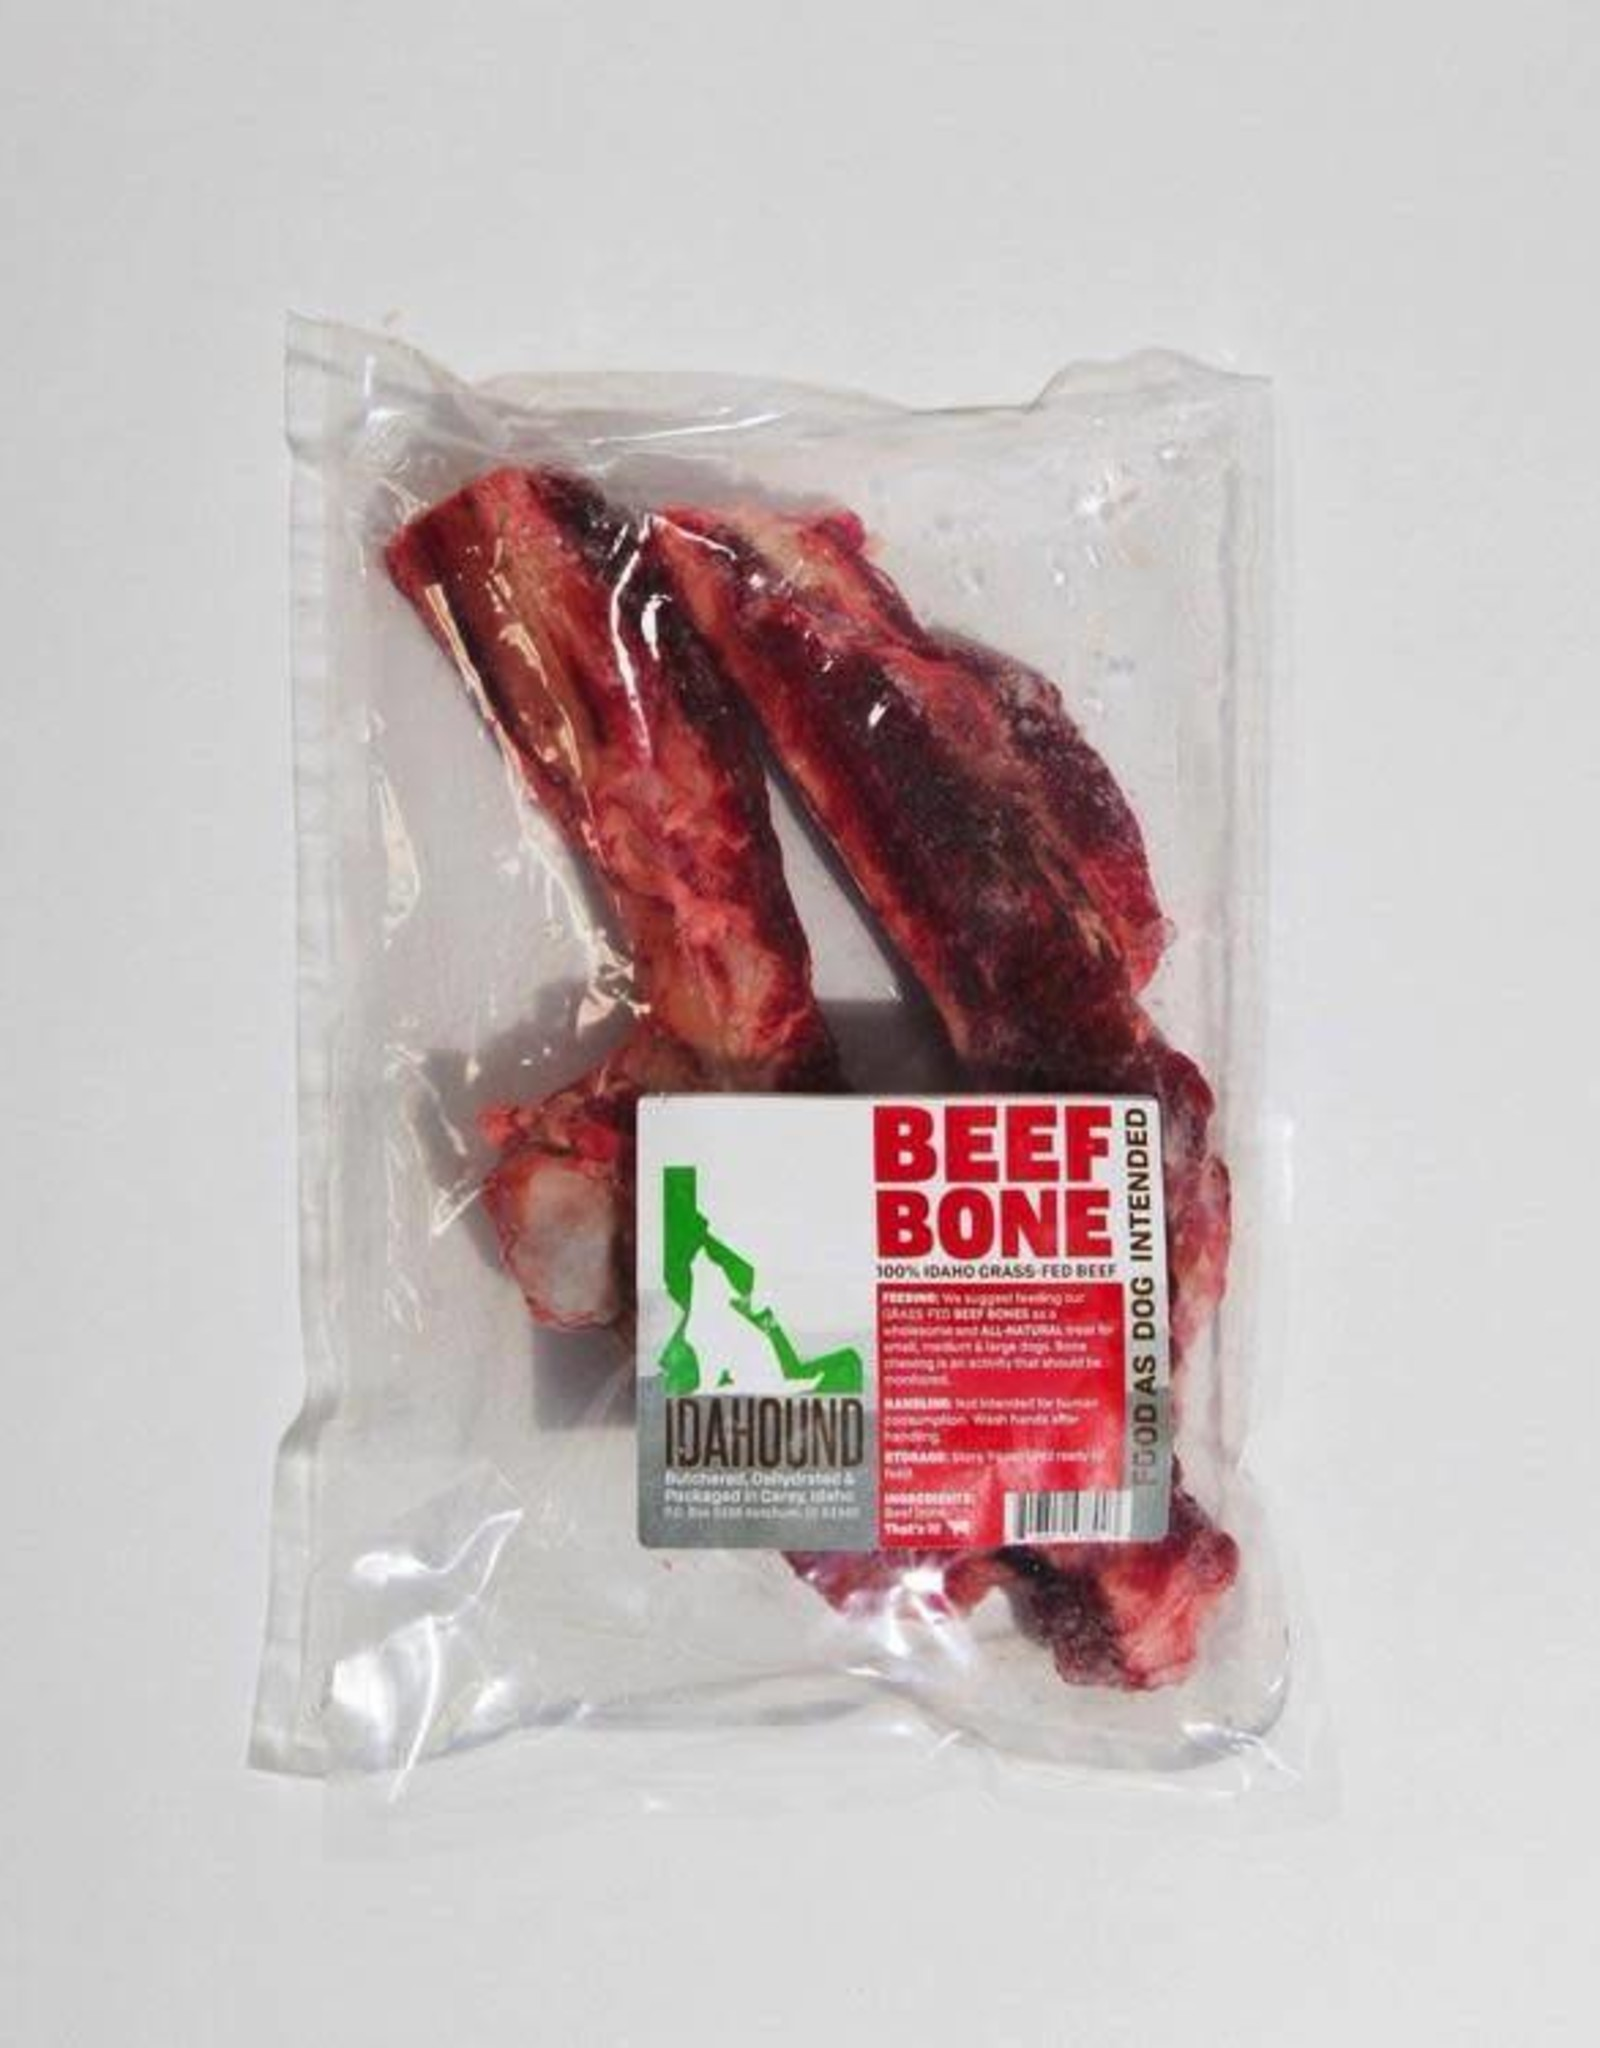 Idahound Idahound Beef Bone - Large